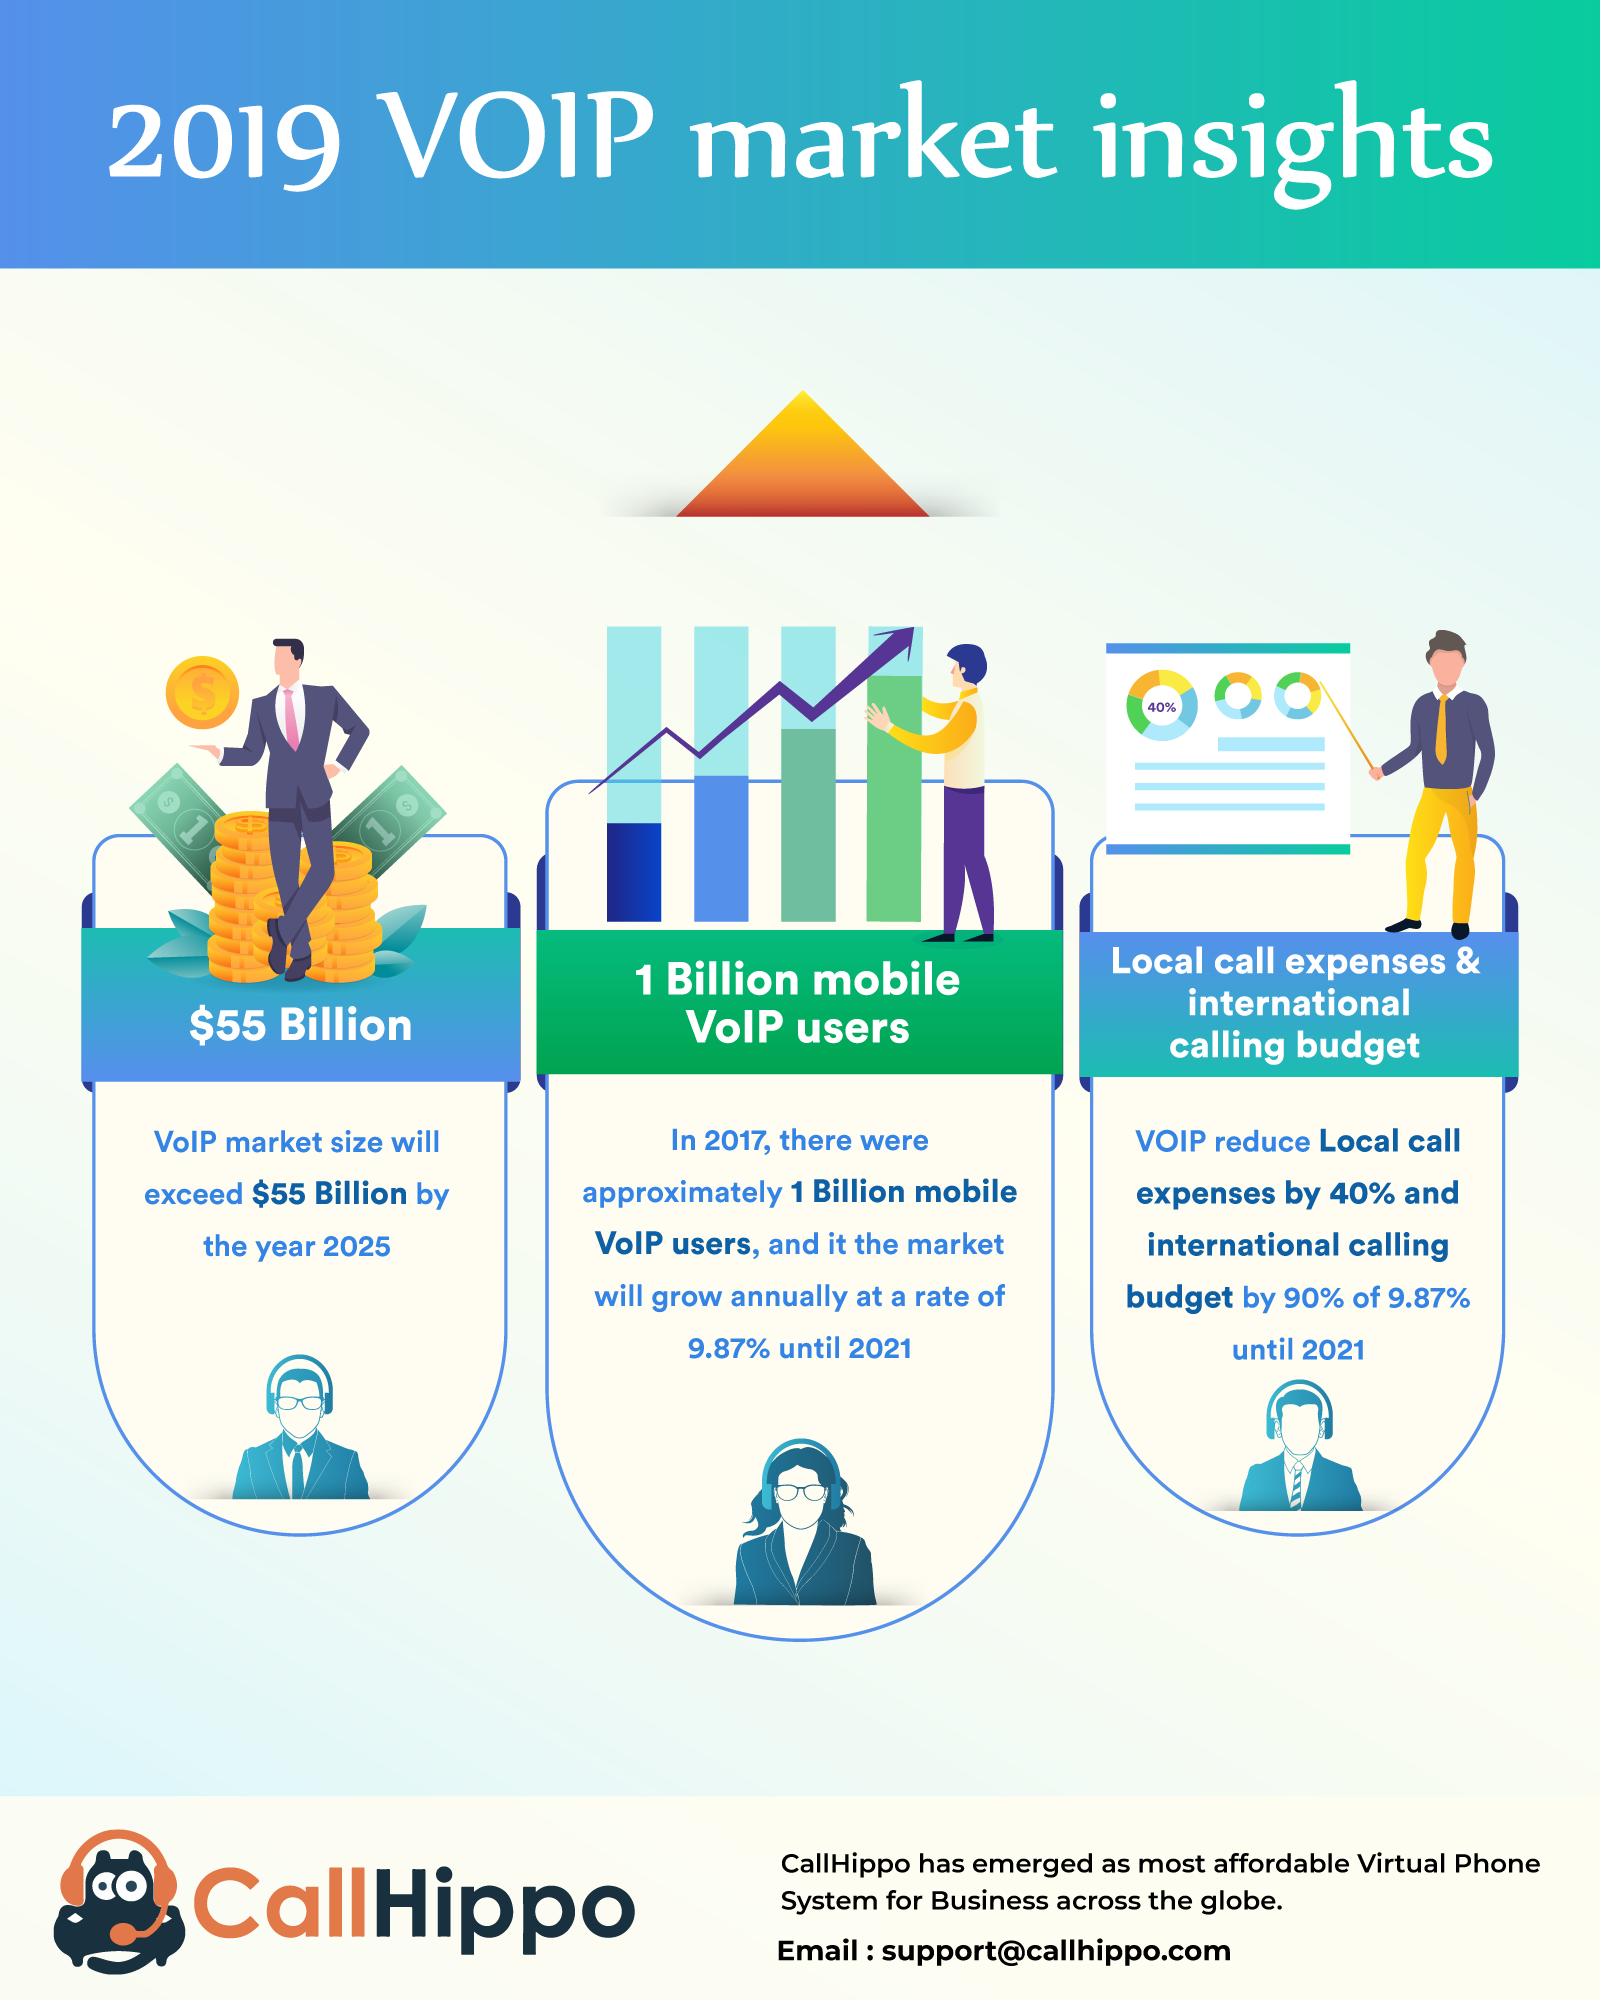 VoIP market insights- CallHippo